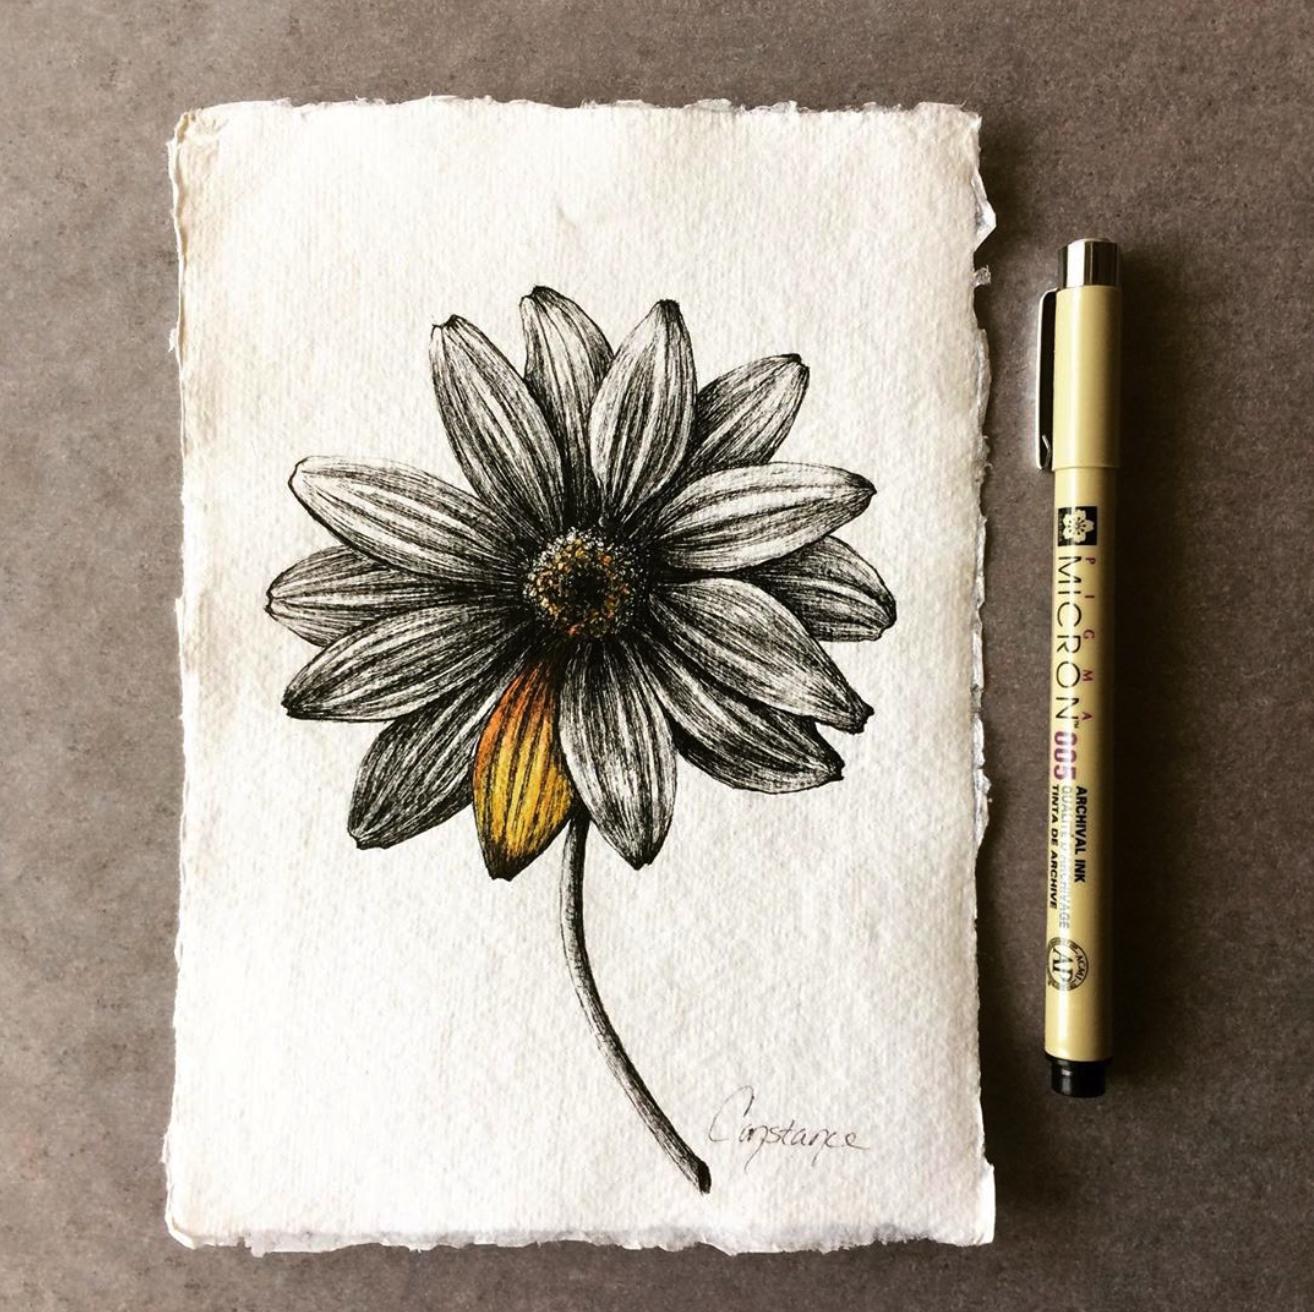 Yellowish Daisy In Black Ink on Handmade Paper, 5x7, ConstanceReeder.Com